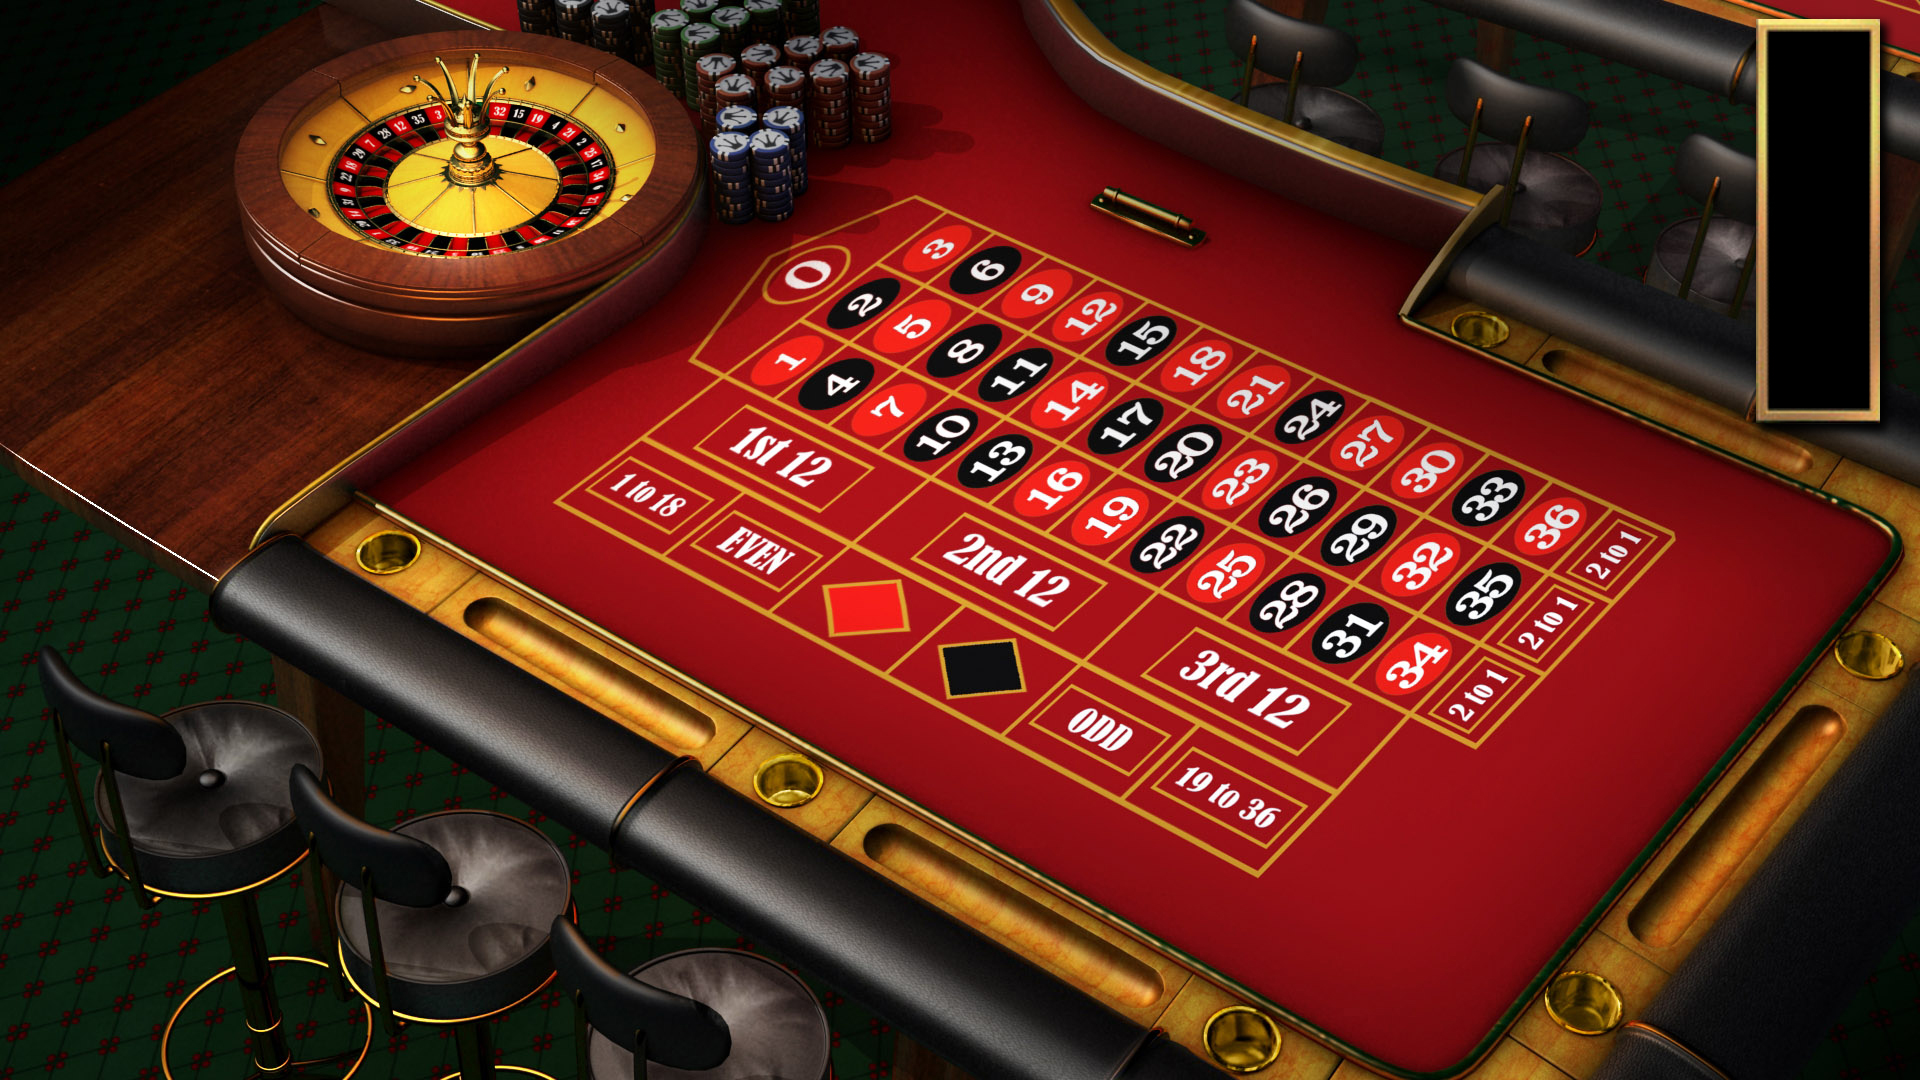 How to win in online roulette casino серова марина казино ты мое